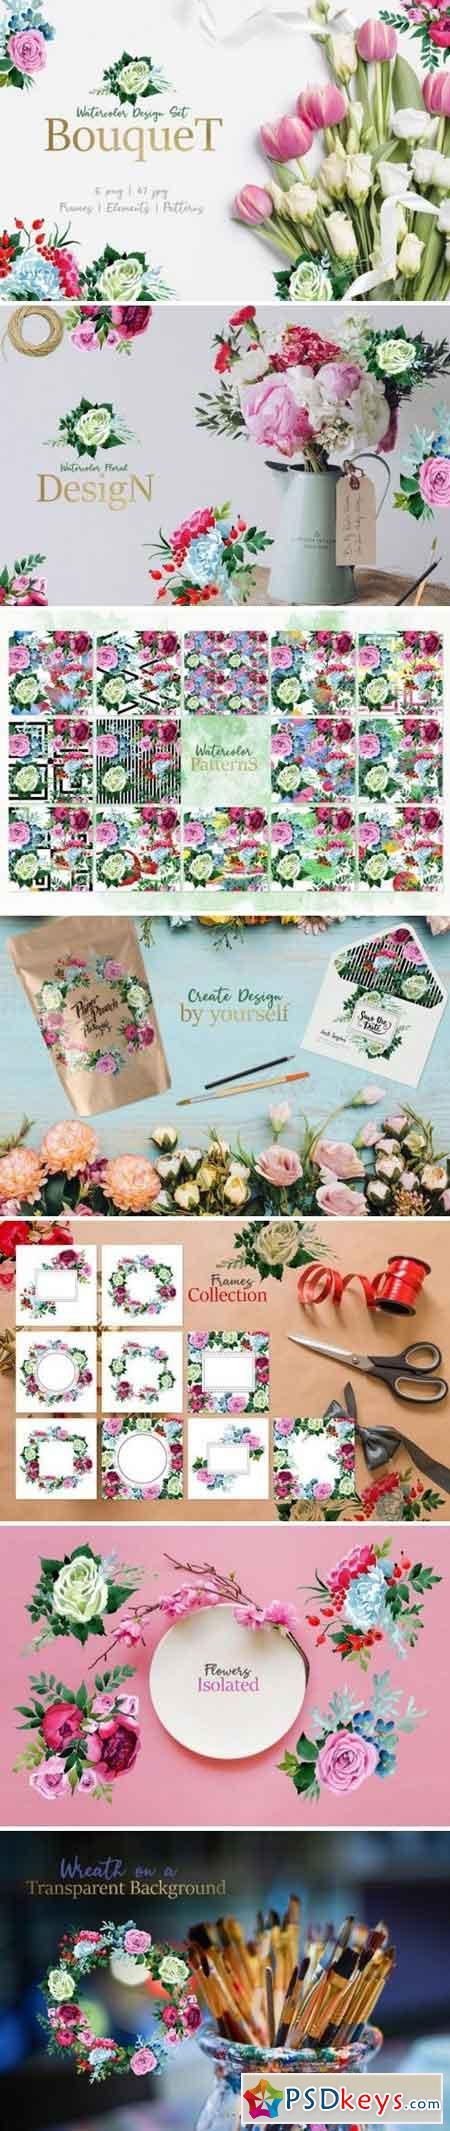 Bouquet pink Tenderness Watercolor 3360516